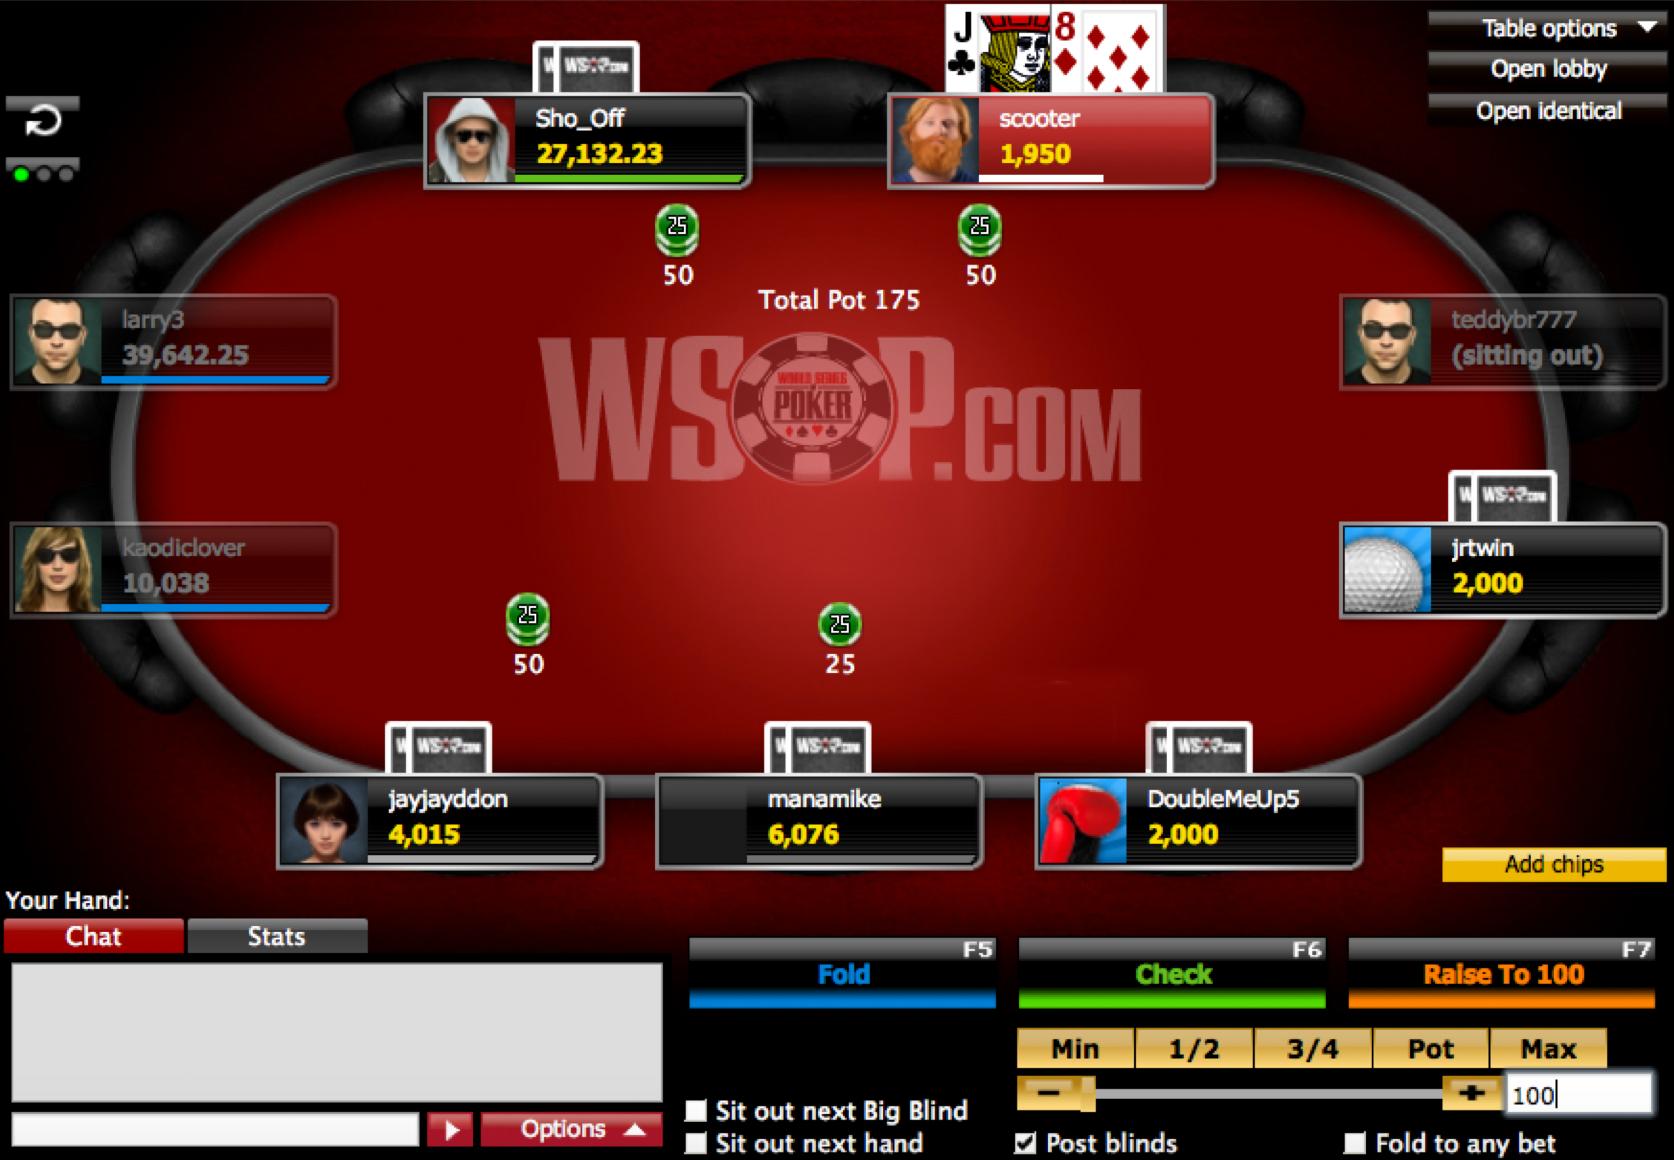 Poker No Deposit Bonus Instant